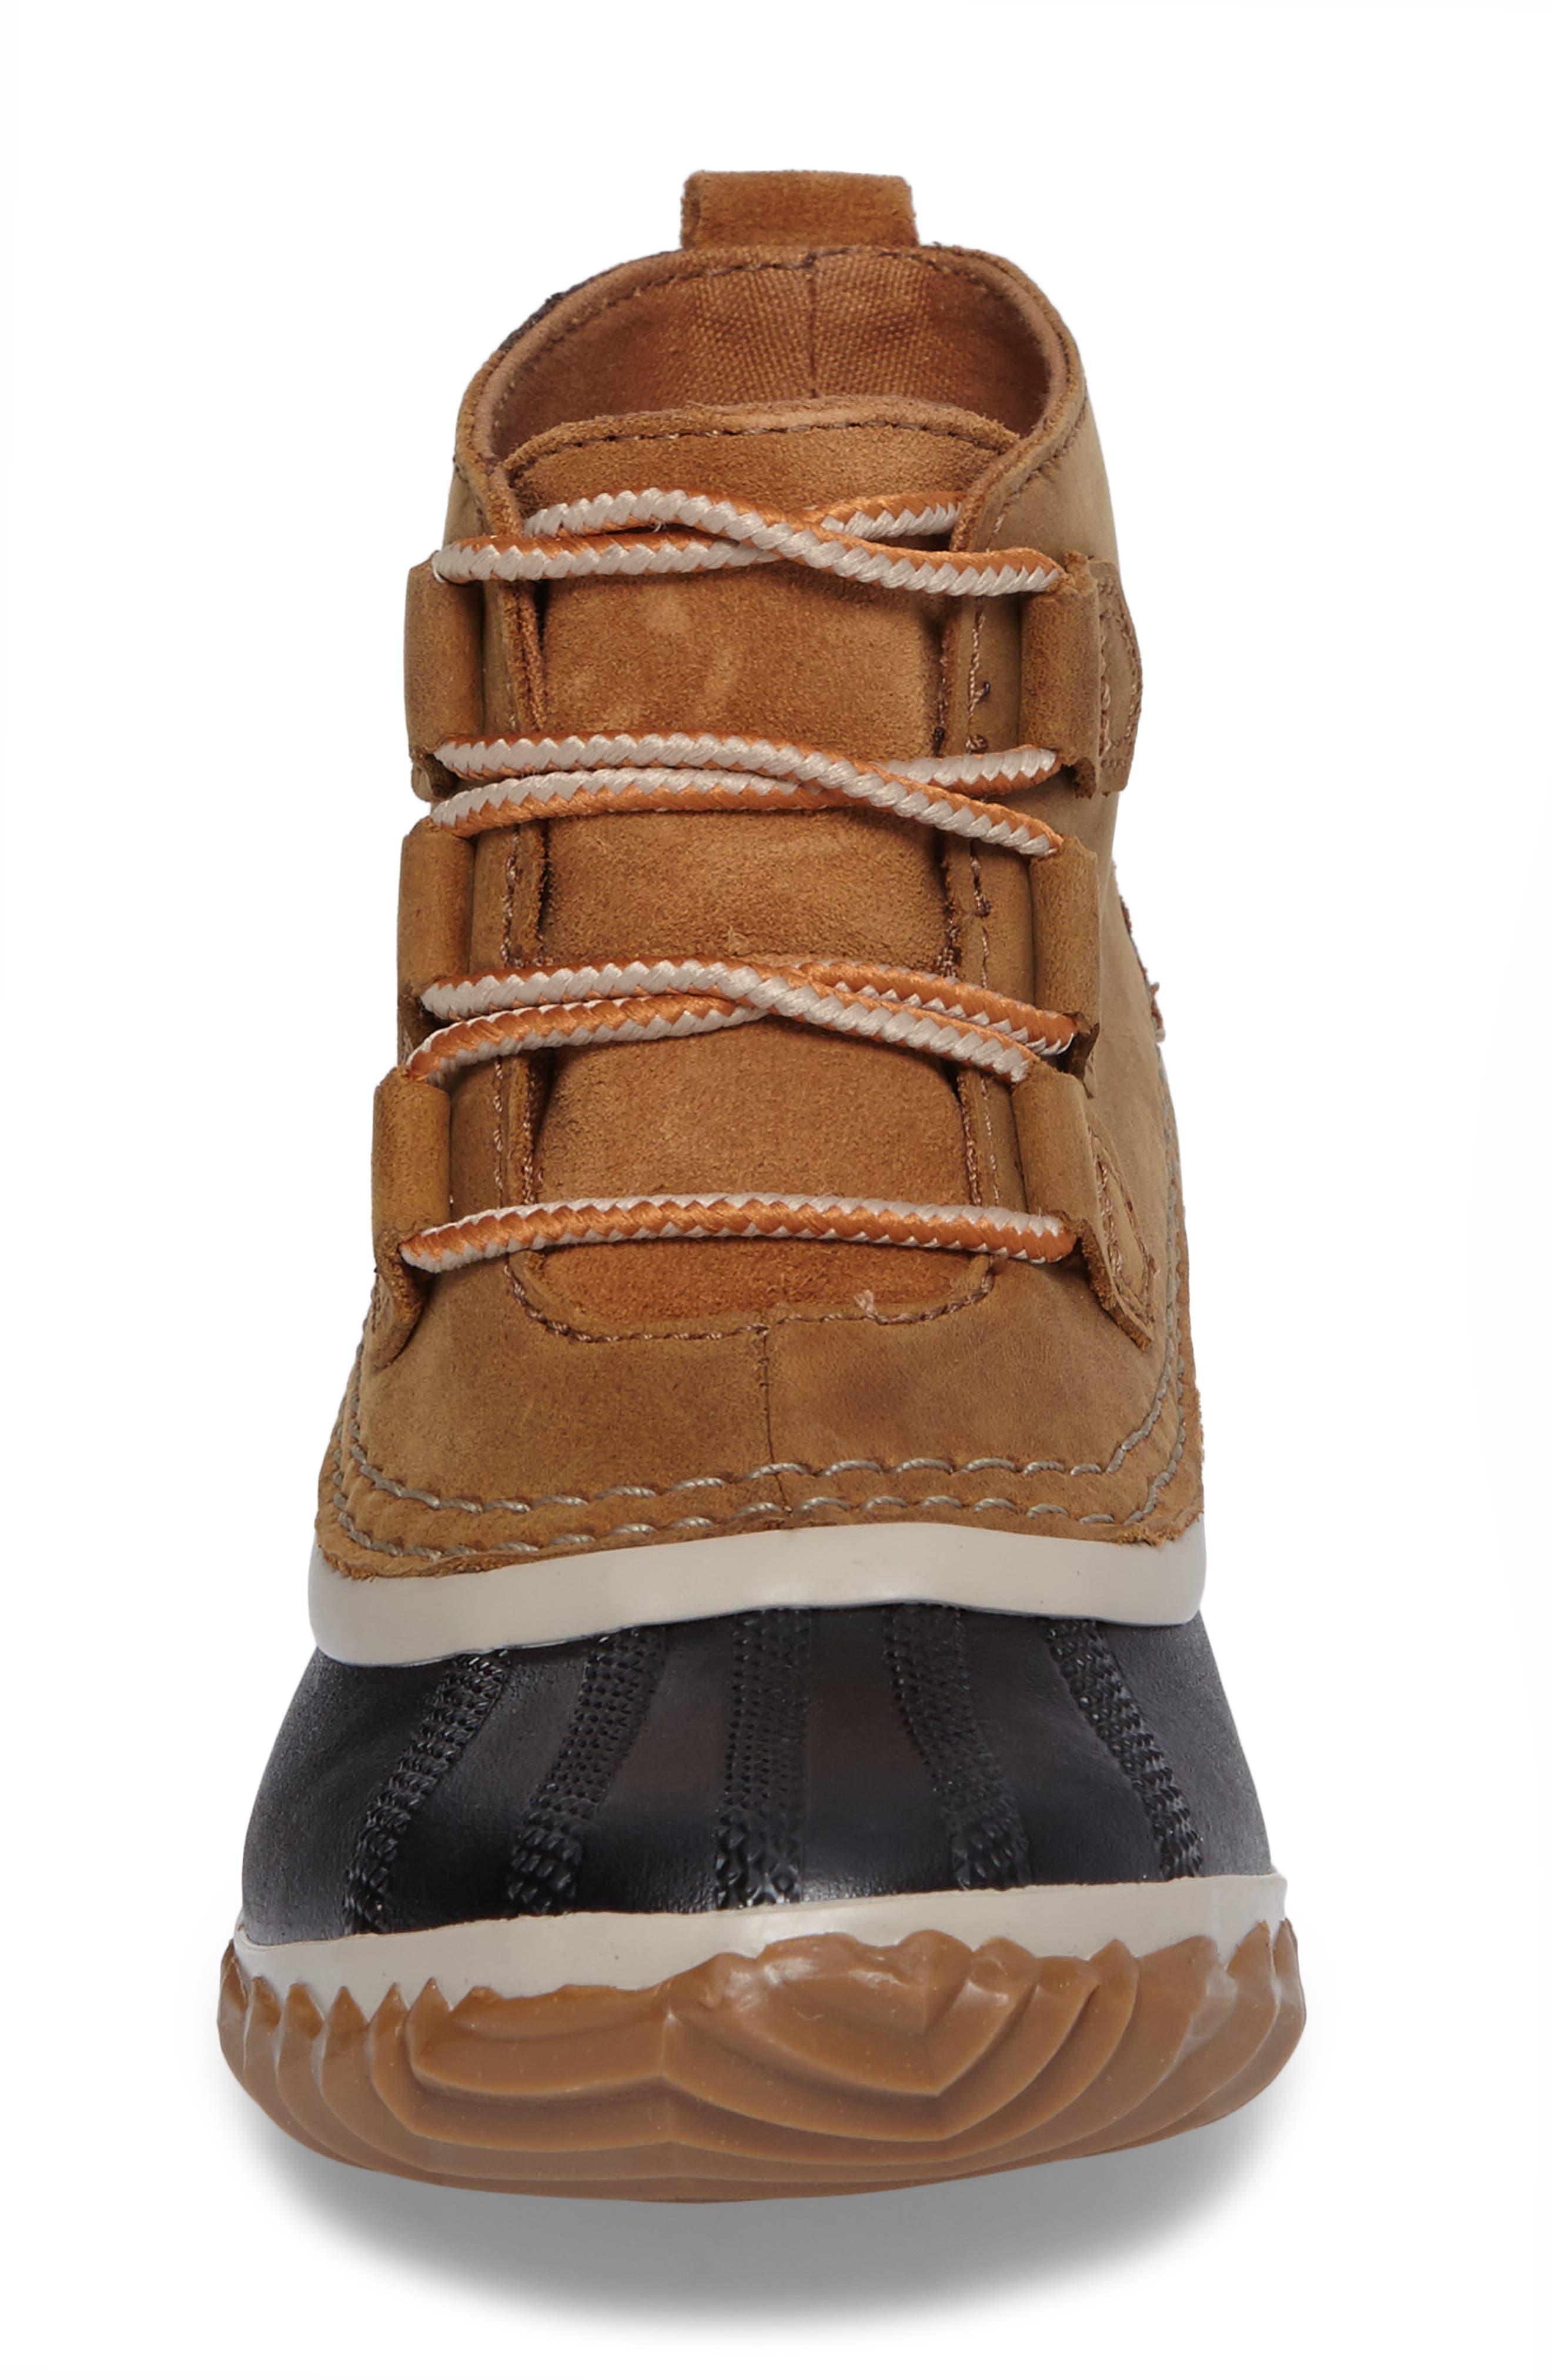 Alternate Image 4  - SOREL Out 'N About® Waterproof Boot (Walker, Toddler, Little Kid & Big Kid)